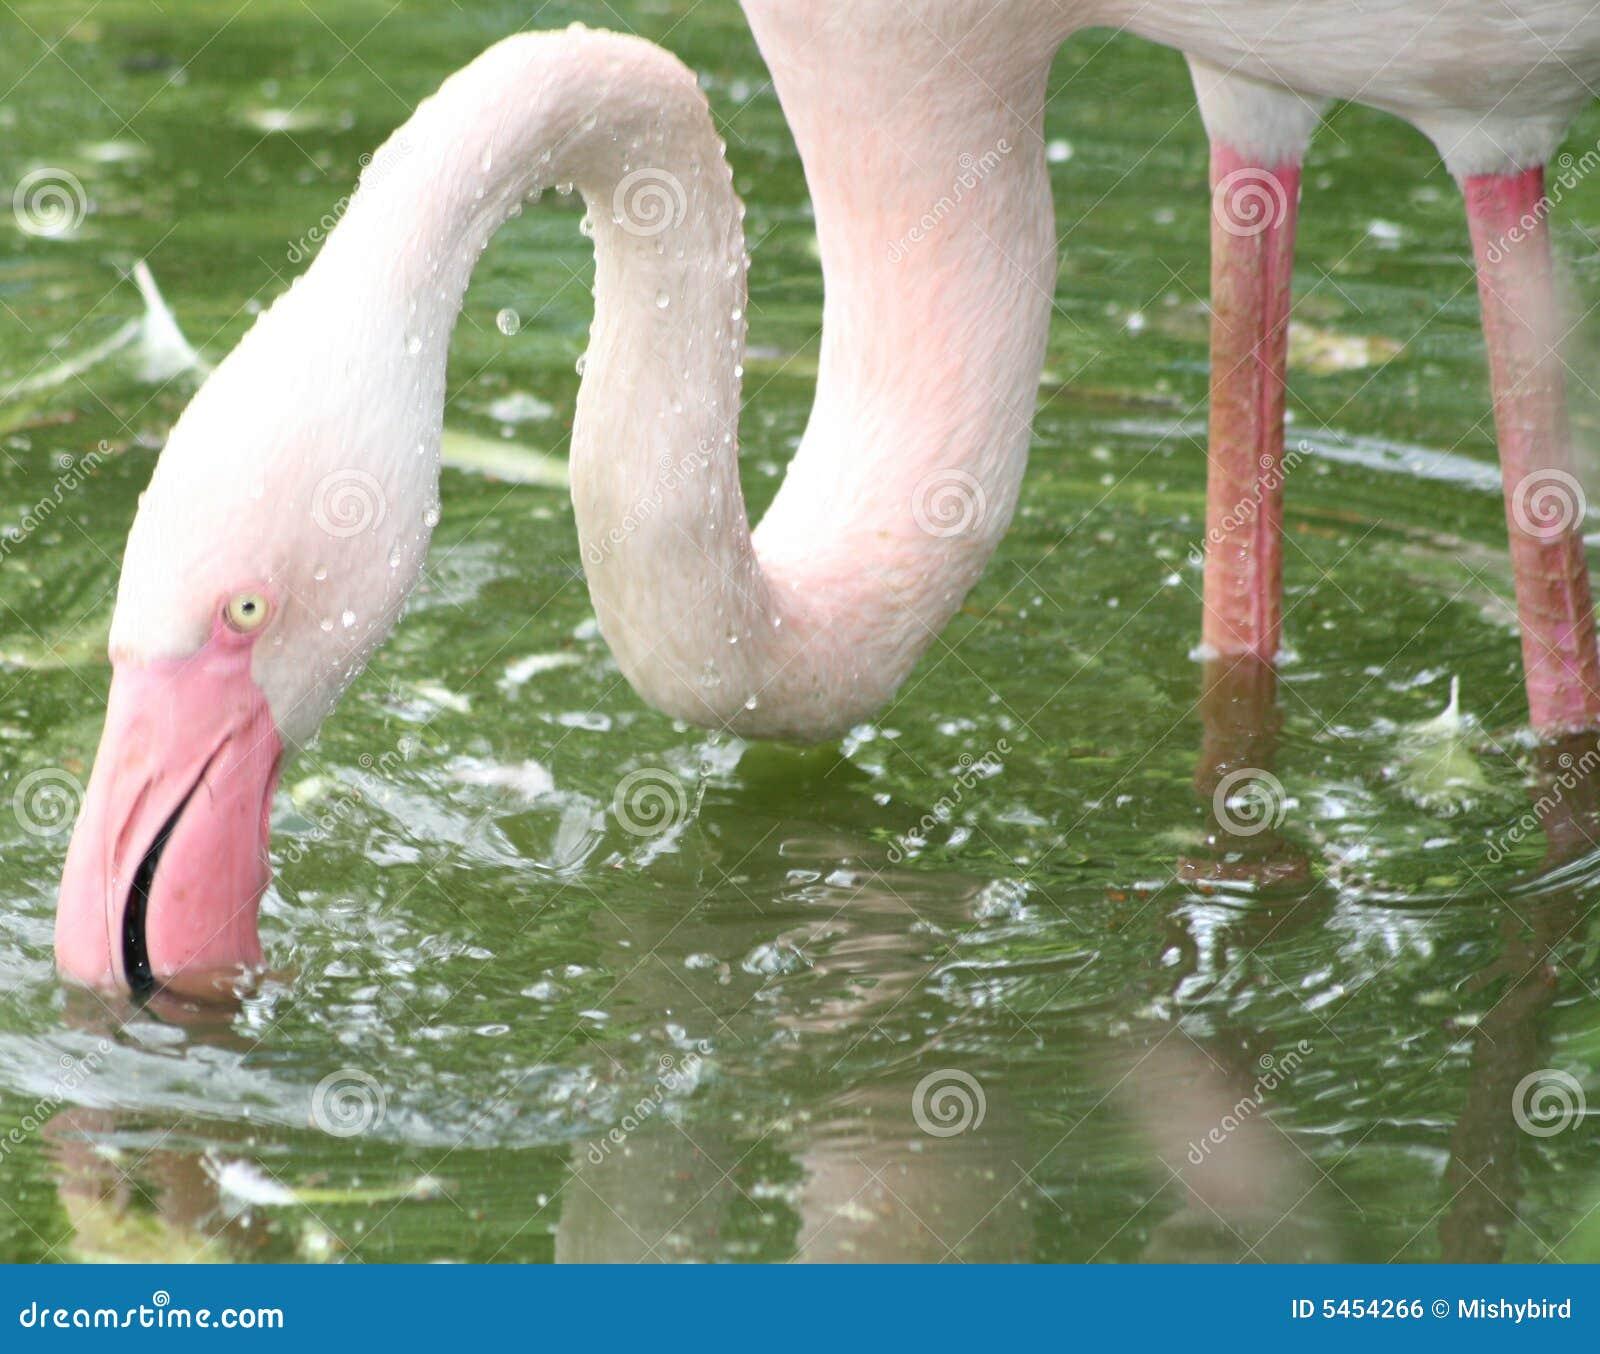 Flamingo feeding in water